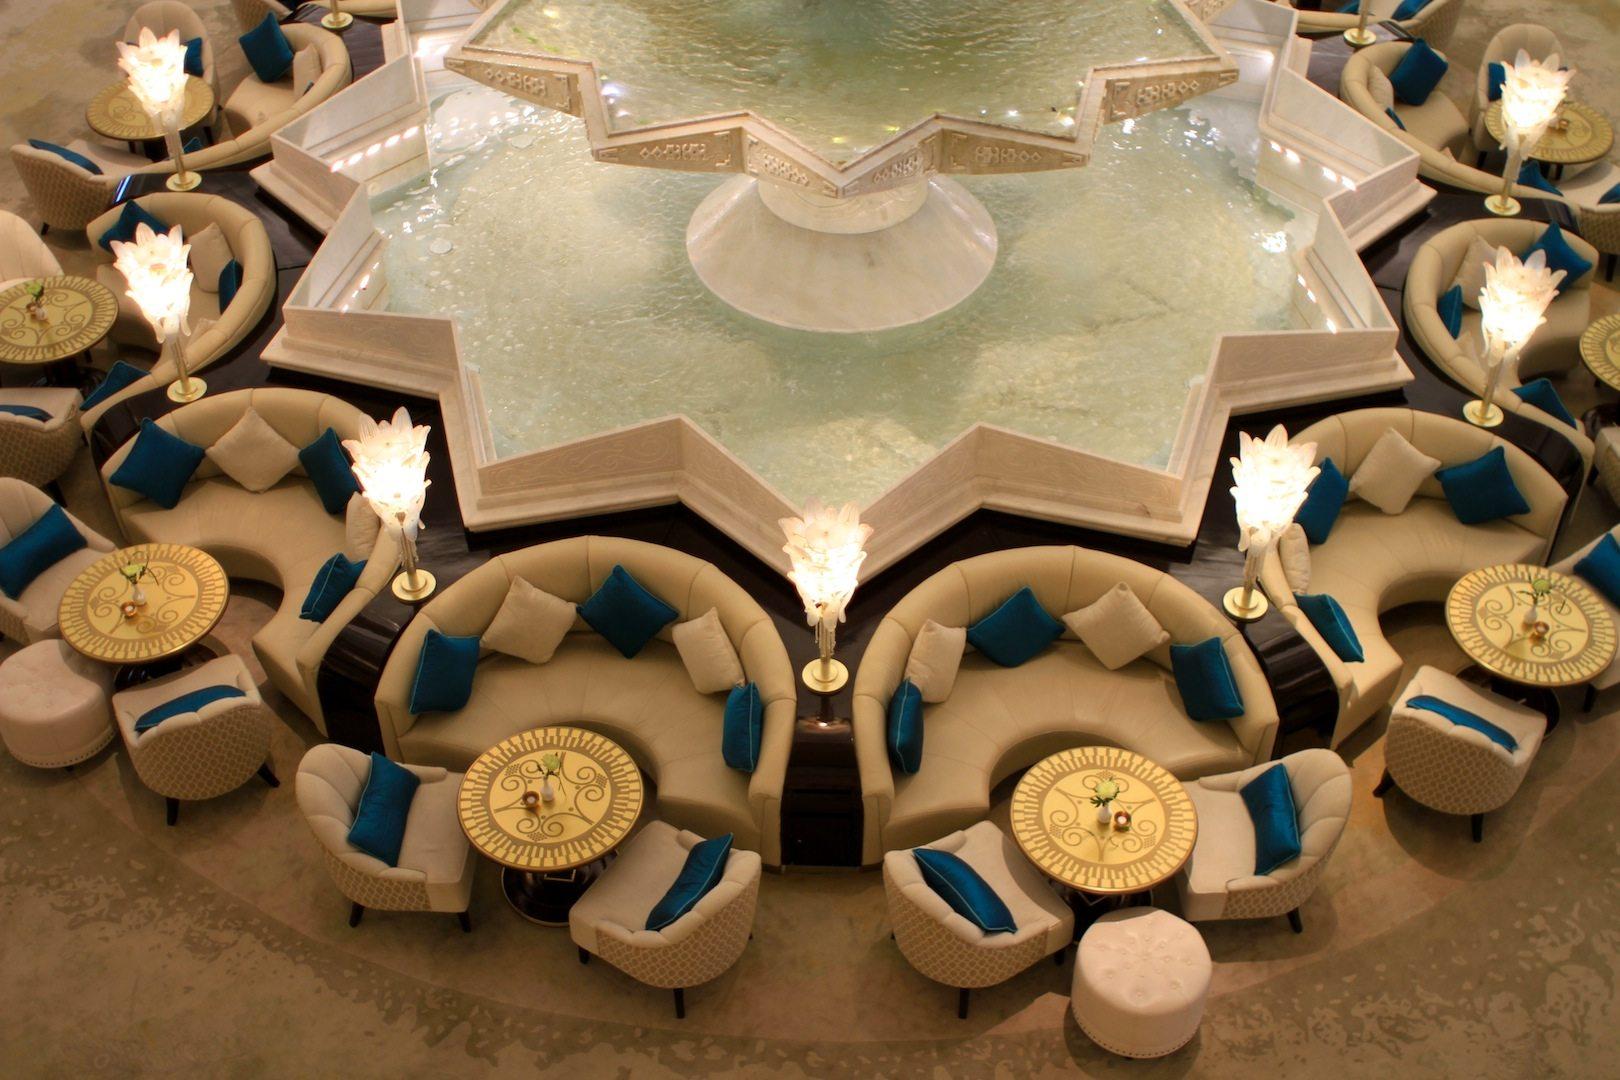 Lobbylandschaft, Teil 2. Waldorf Astoria